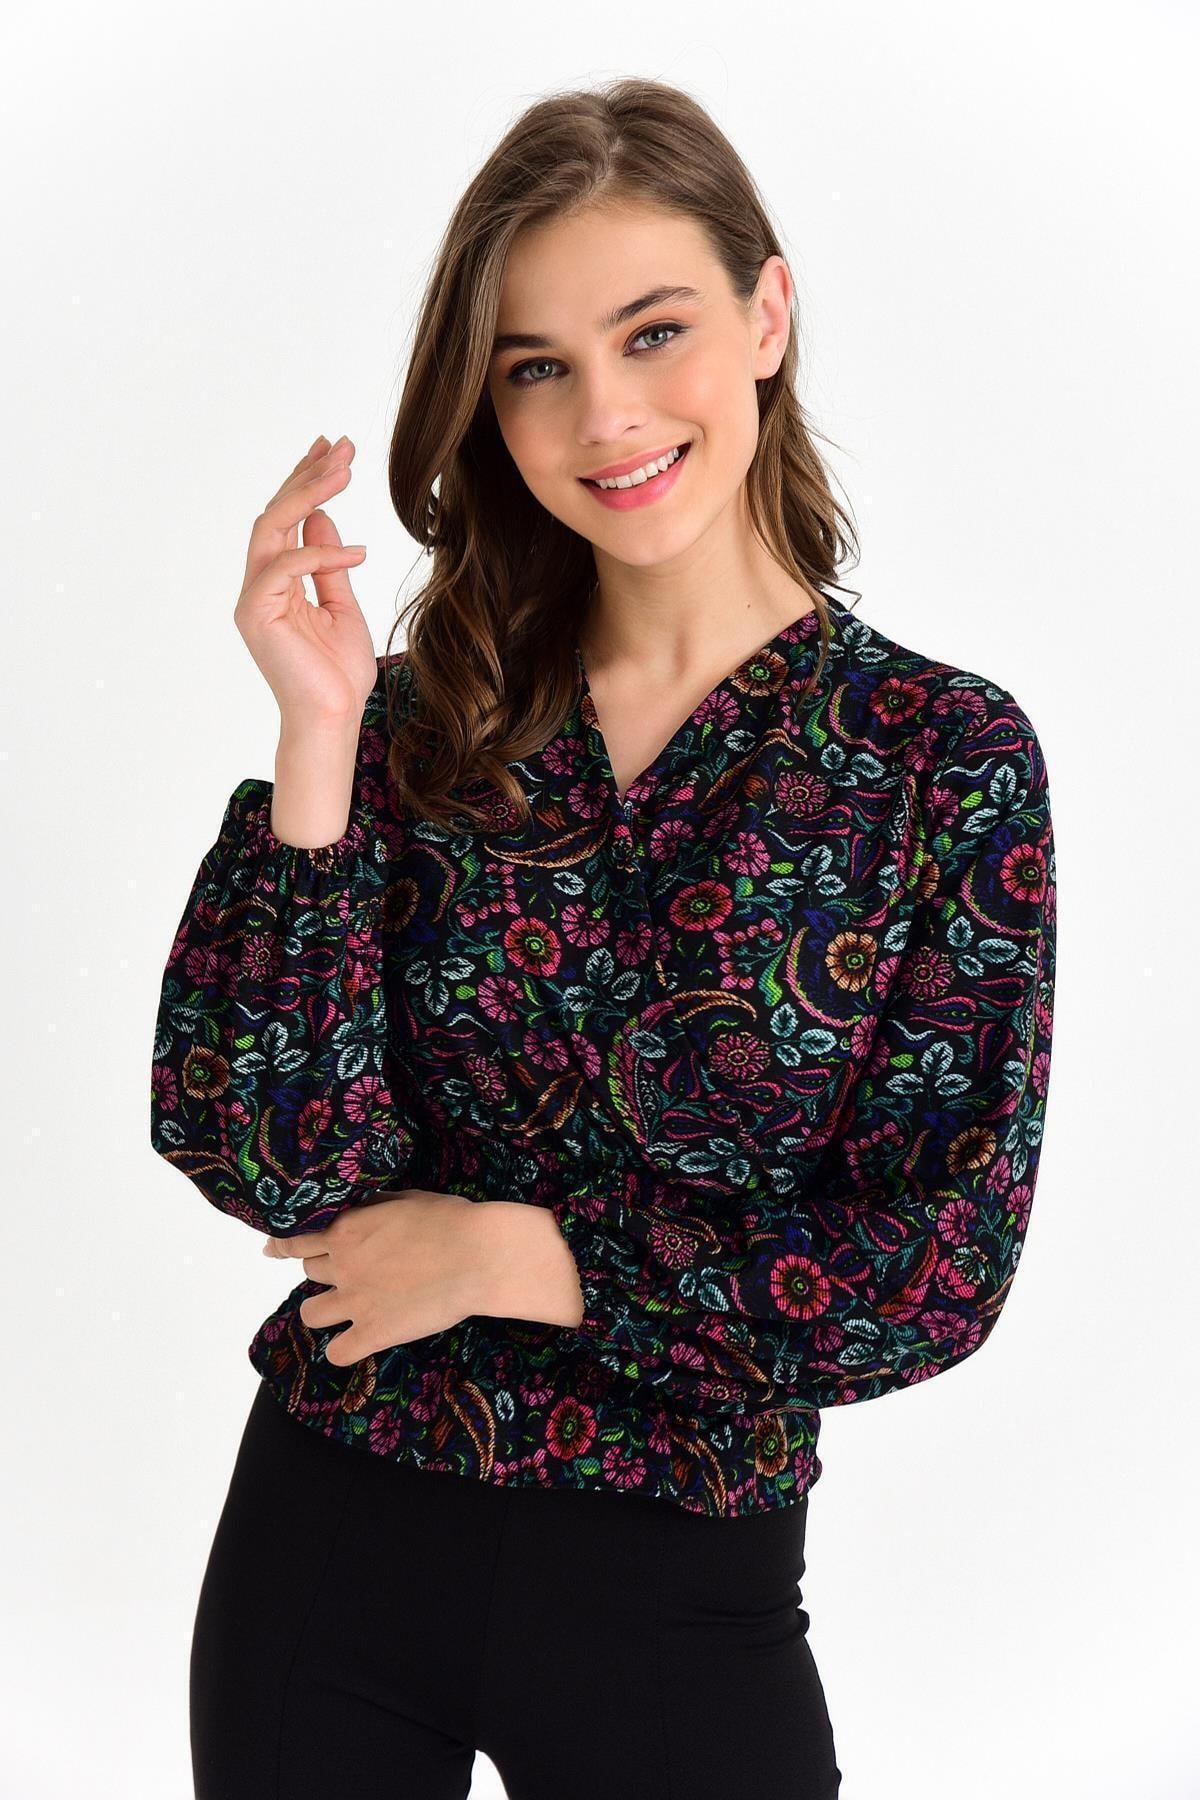 TENA MODA Kadın Siyah-fuşya Örme Crep Gipeli Bluz 2